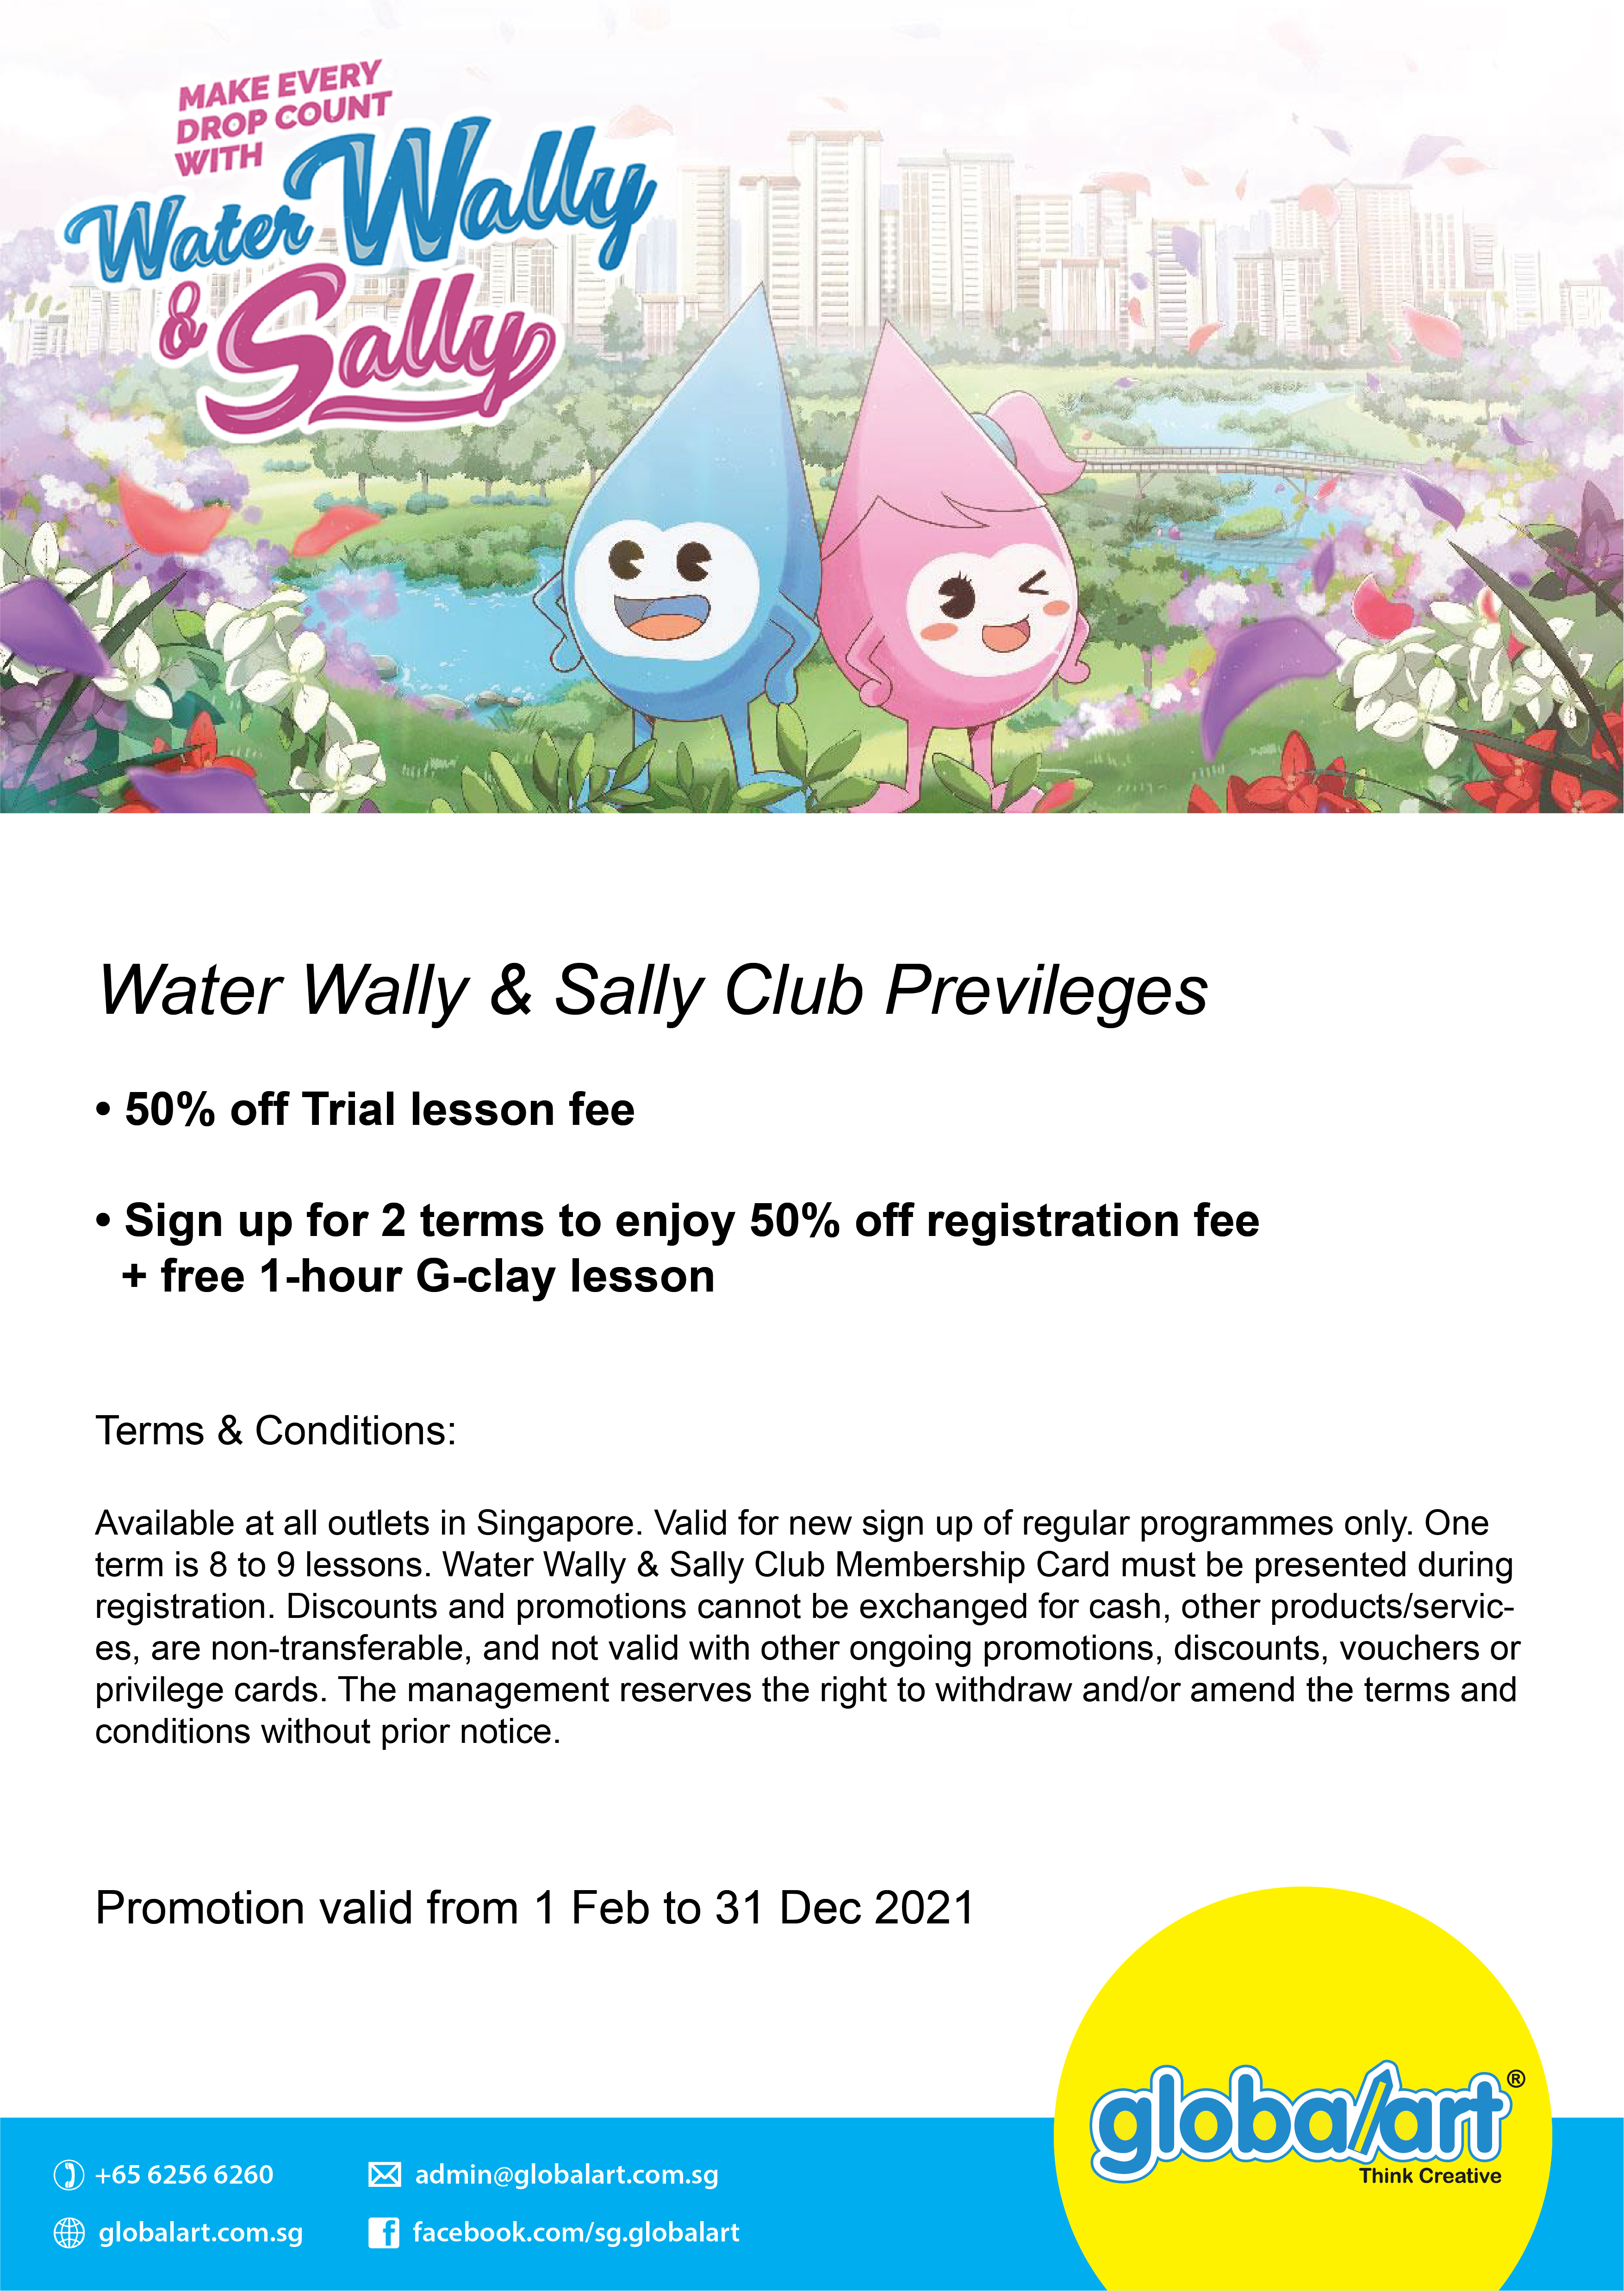 Water Wally & Sally Club 2021